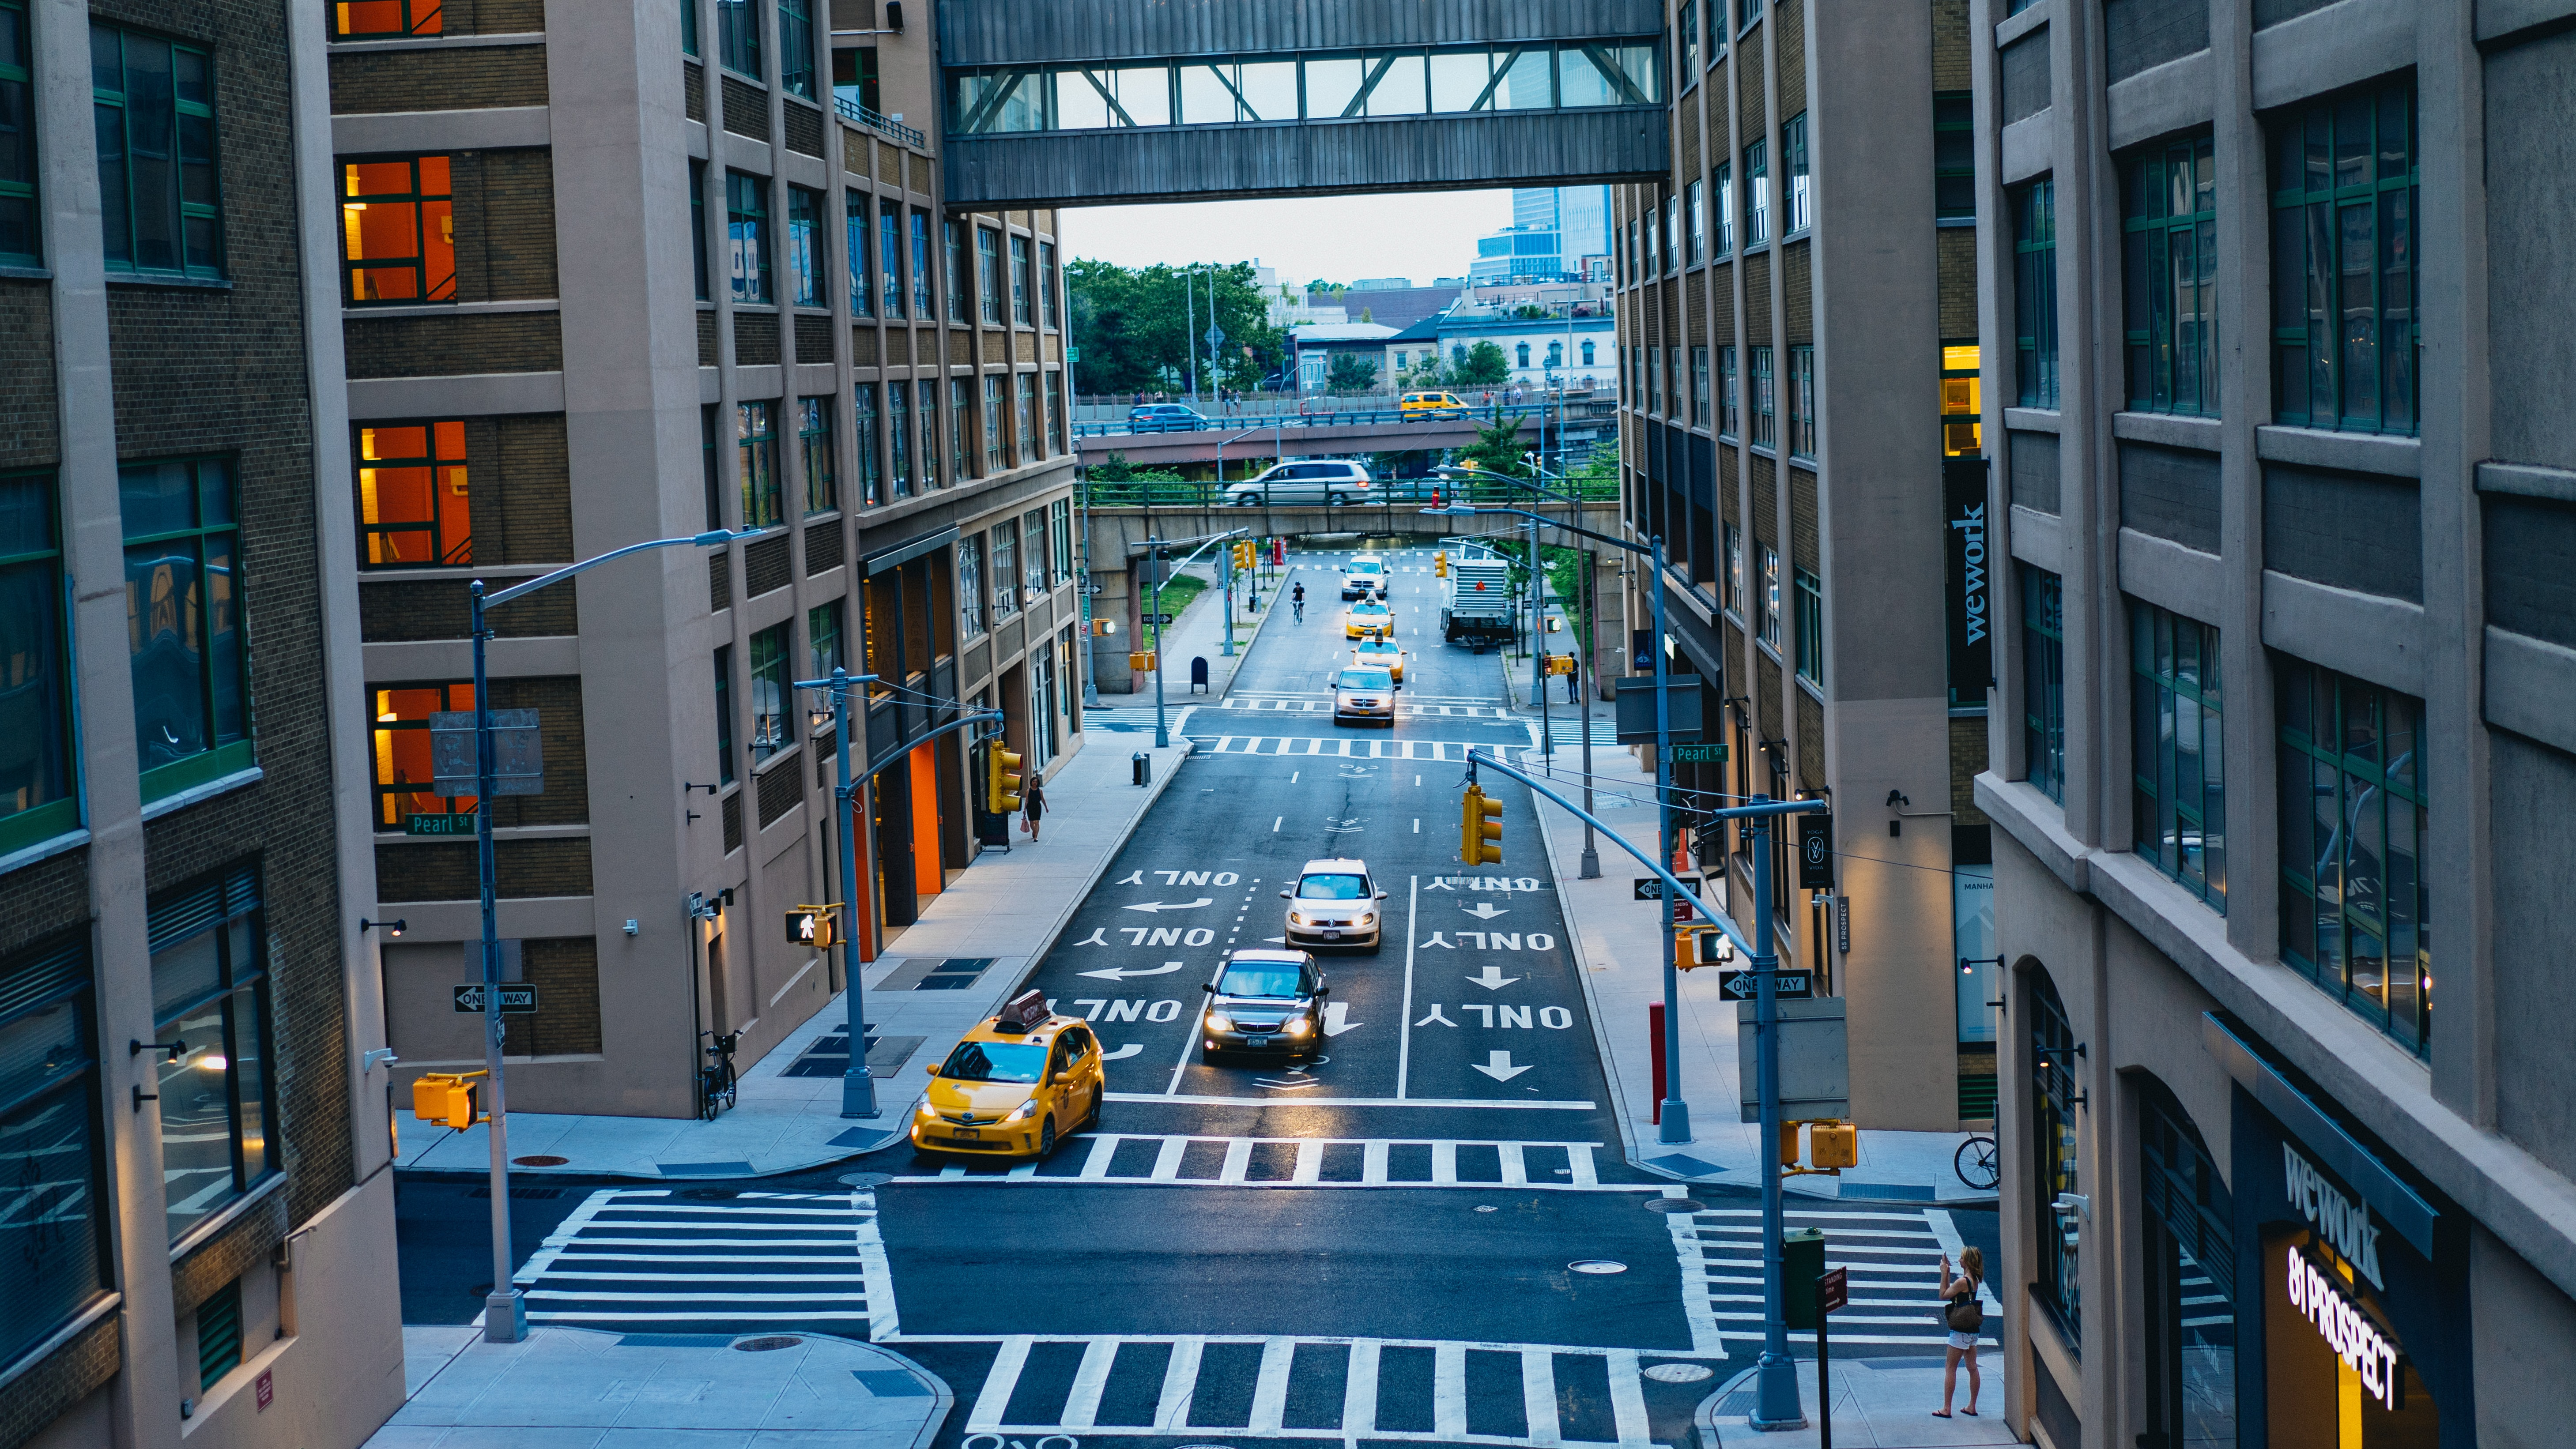 road between brown and black high-rise buildings